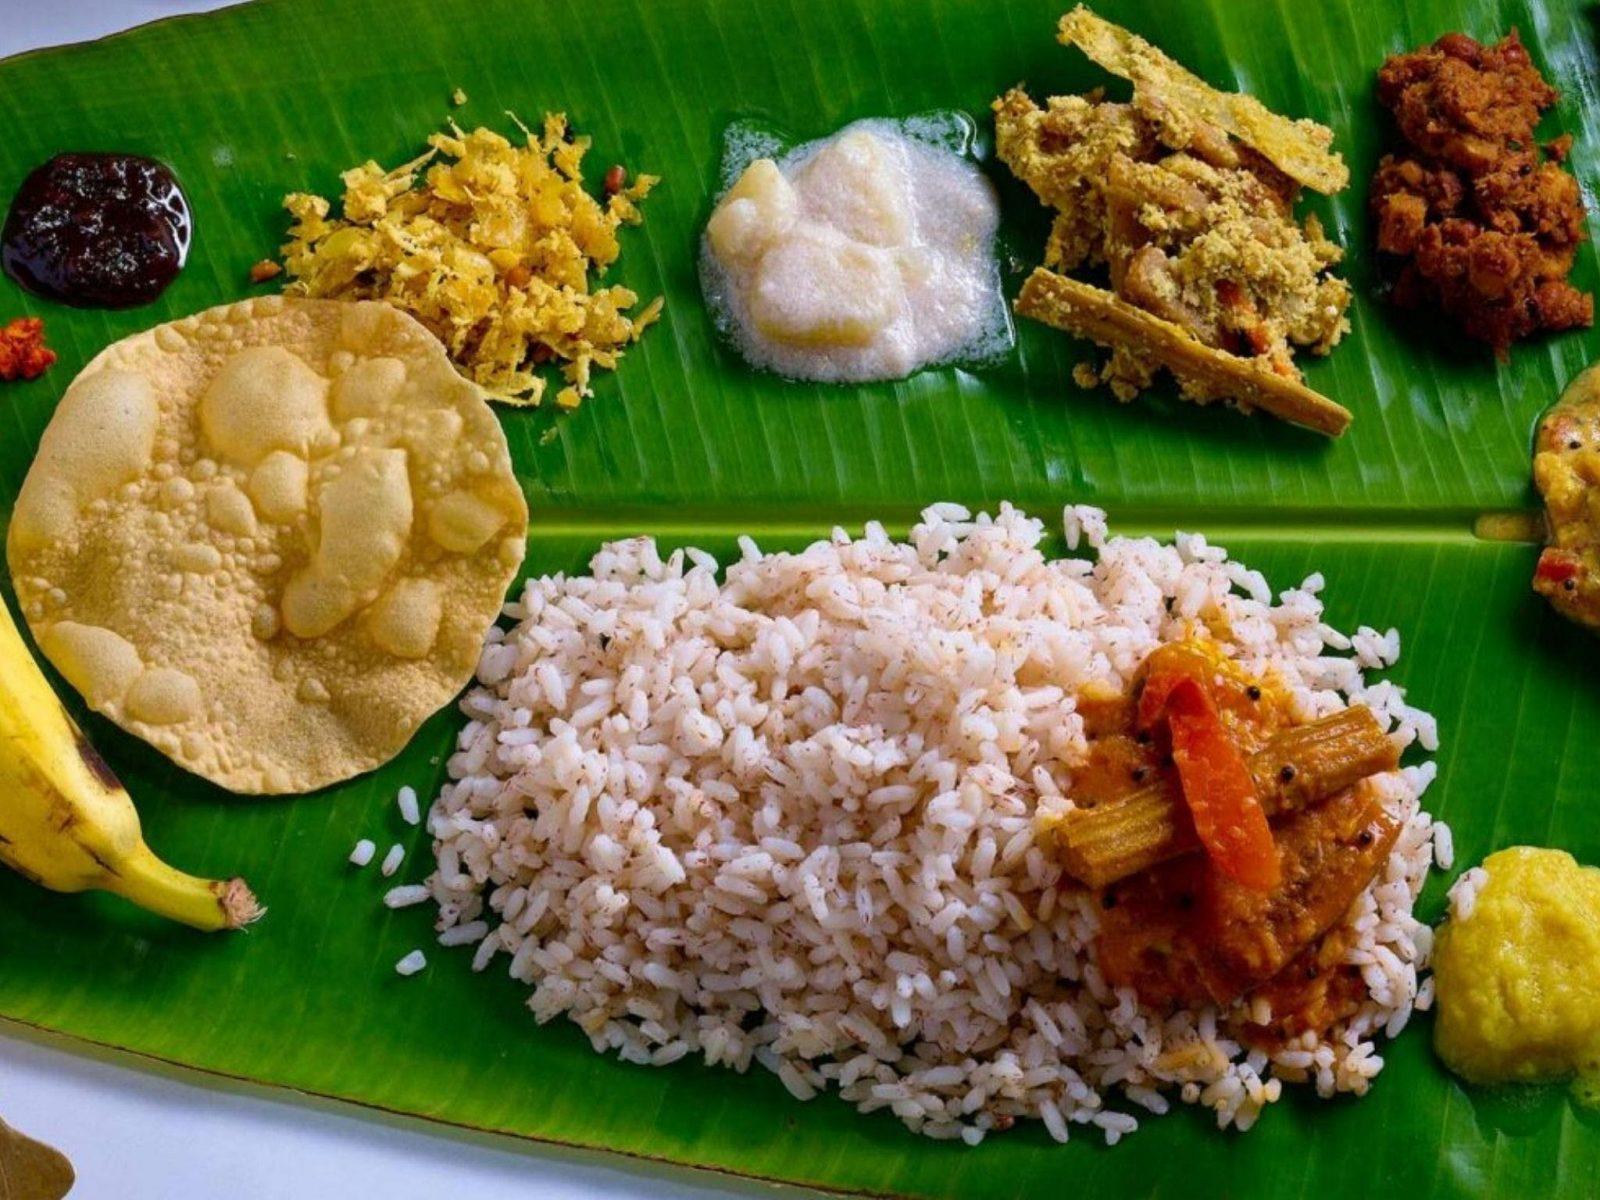 South Indian banana leaf banquet